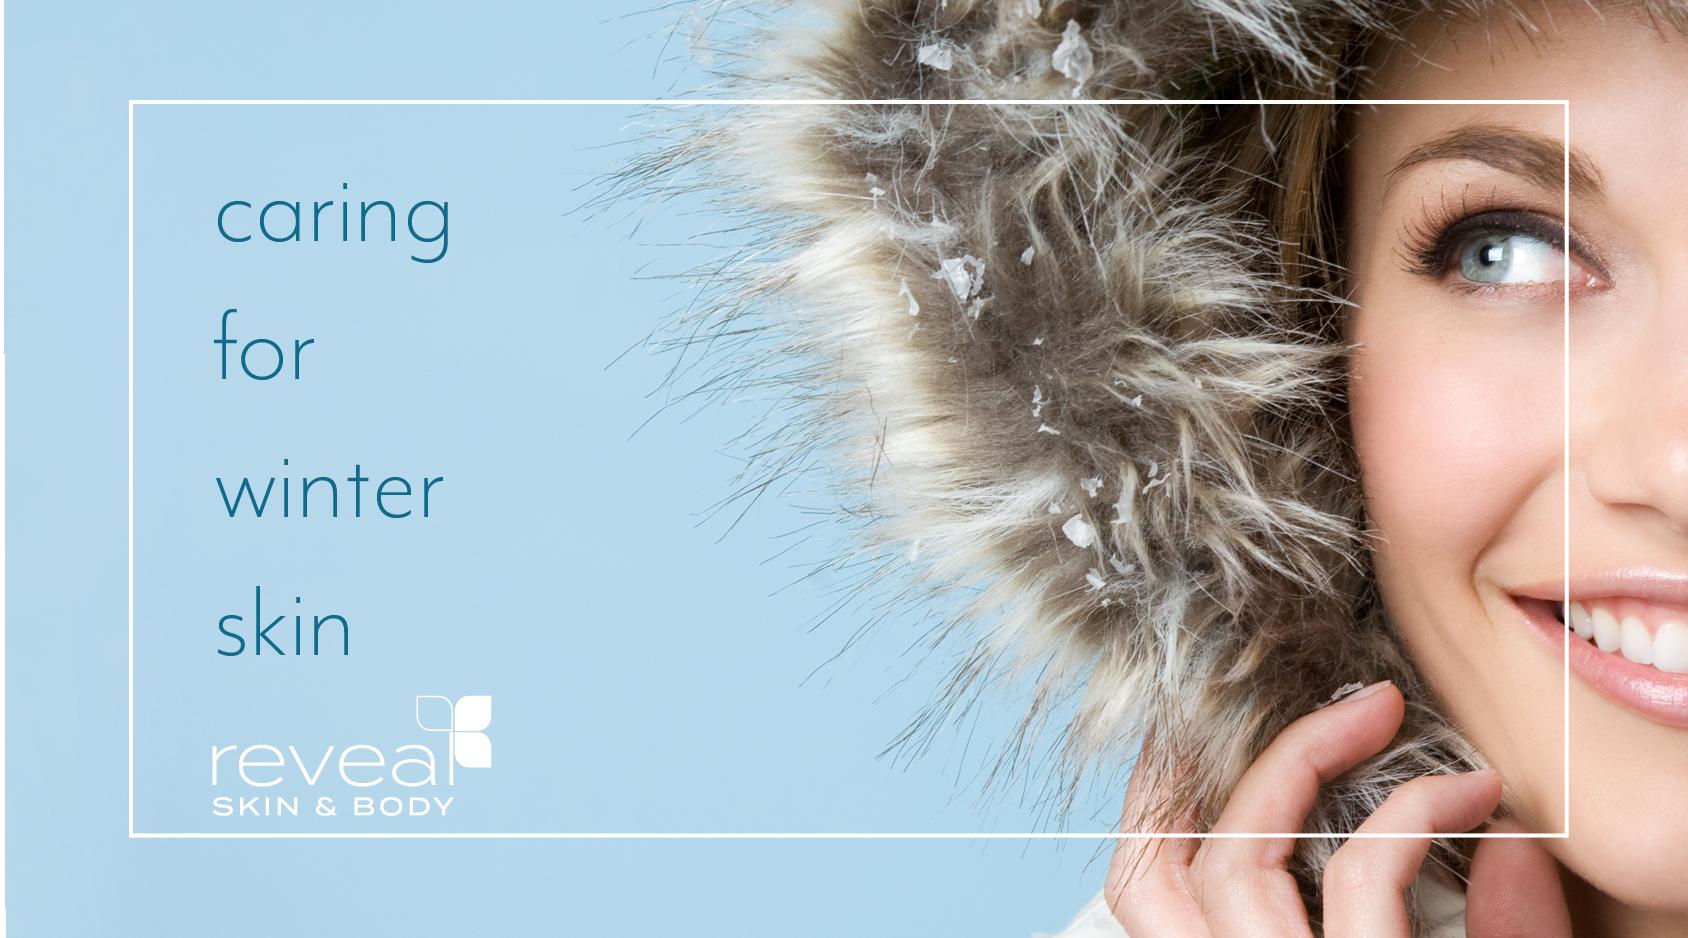 winter skin care beauty therapy papamoa